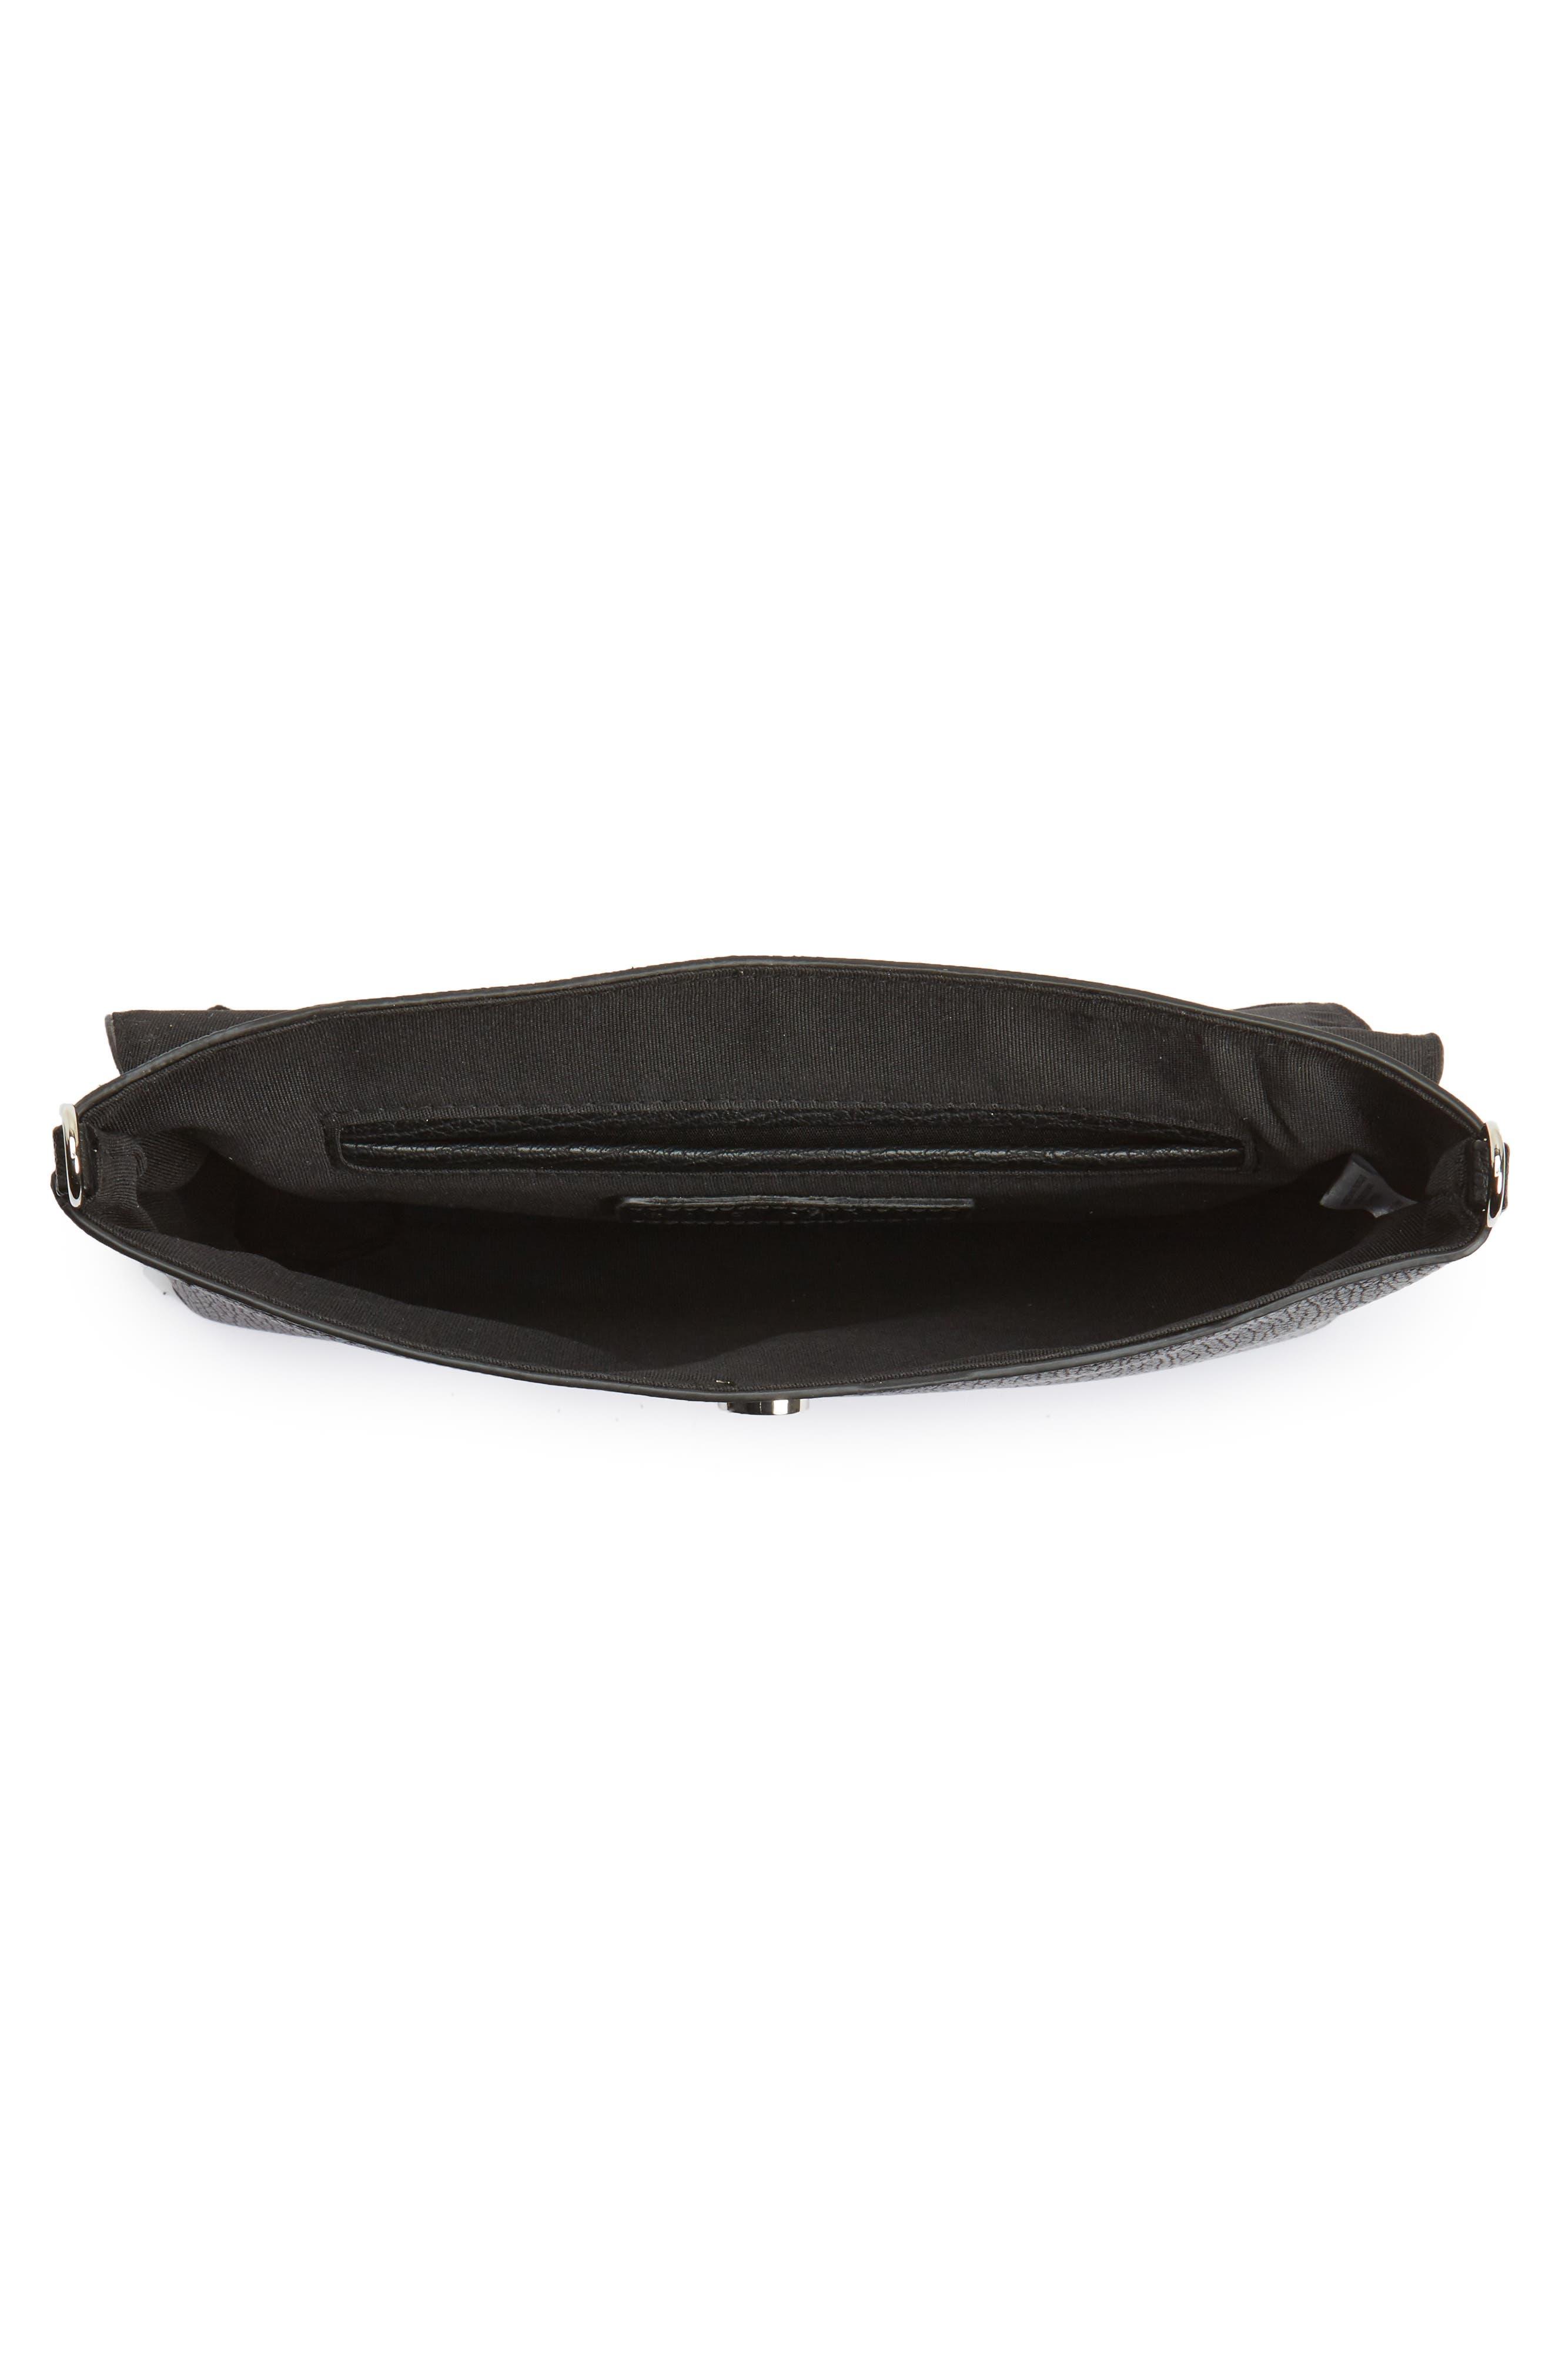 Divya Faux Leather Convertible Clutch,                             Alternate thumbnail 10, color,